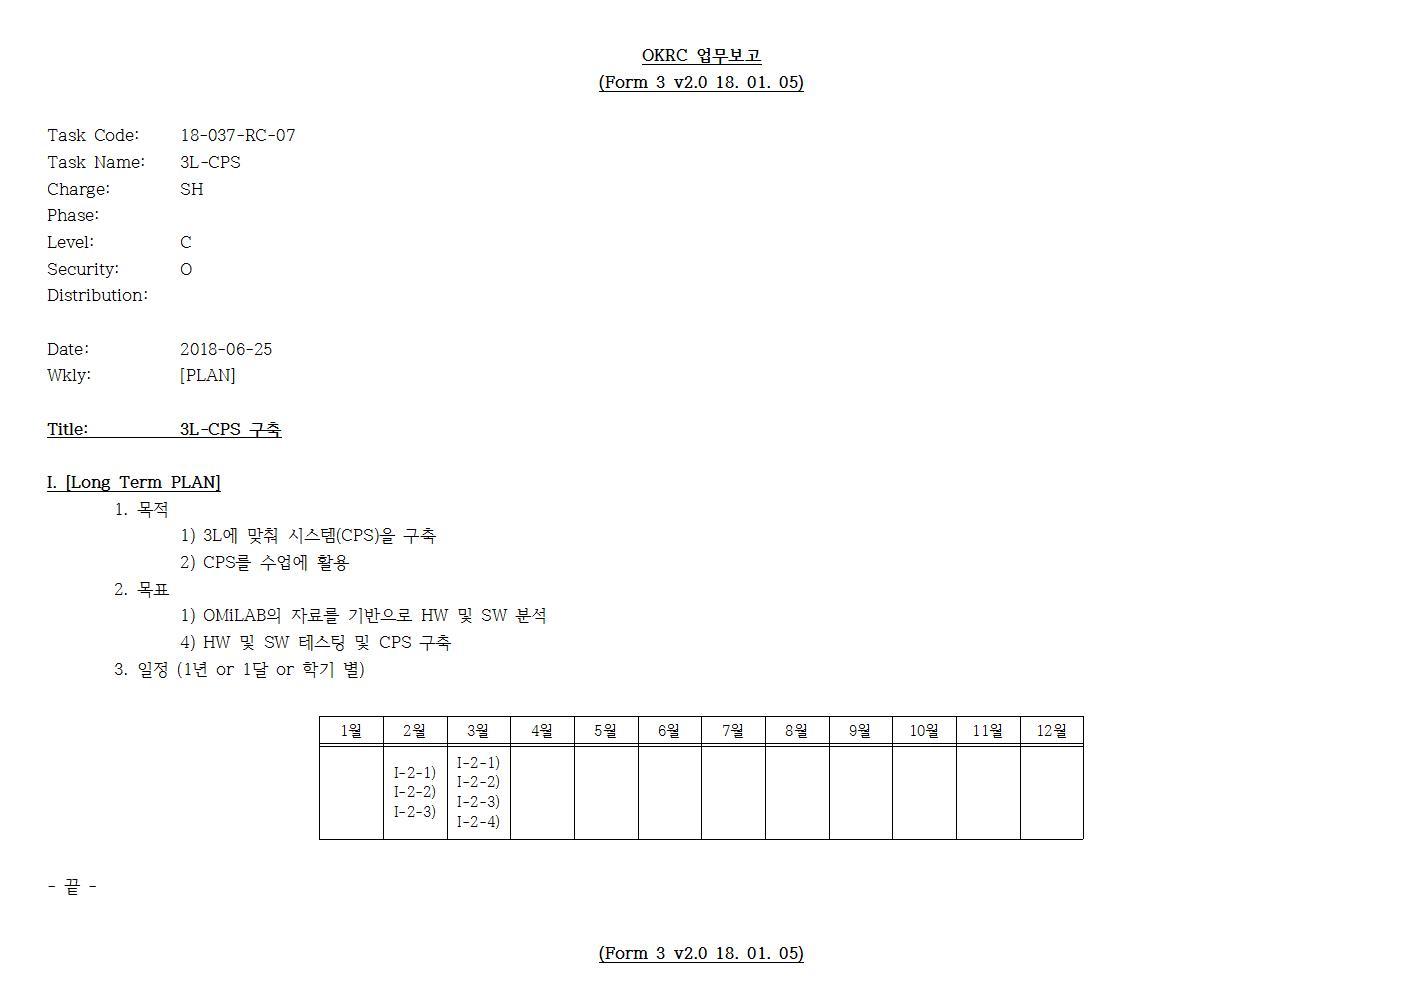 D-[18-037-RC-07]-[3L-CPS]-[2018-06-28][SH]001.jpg